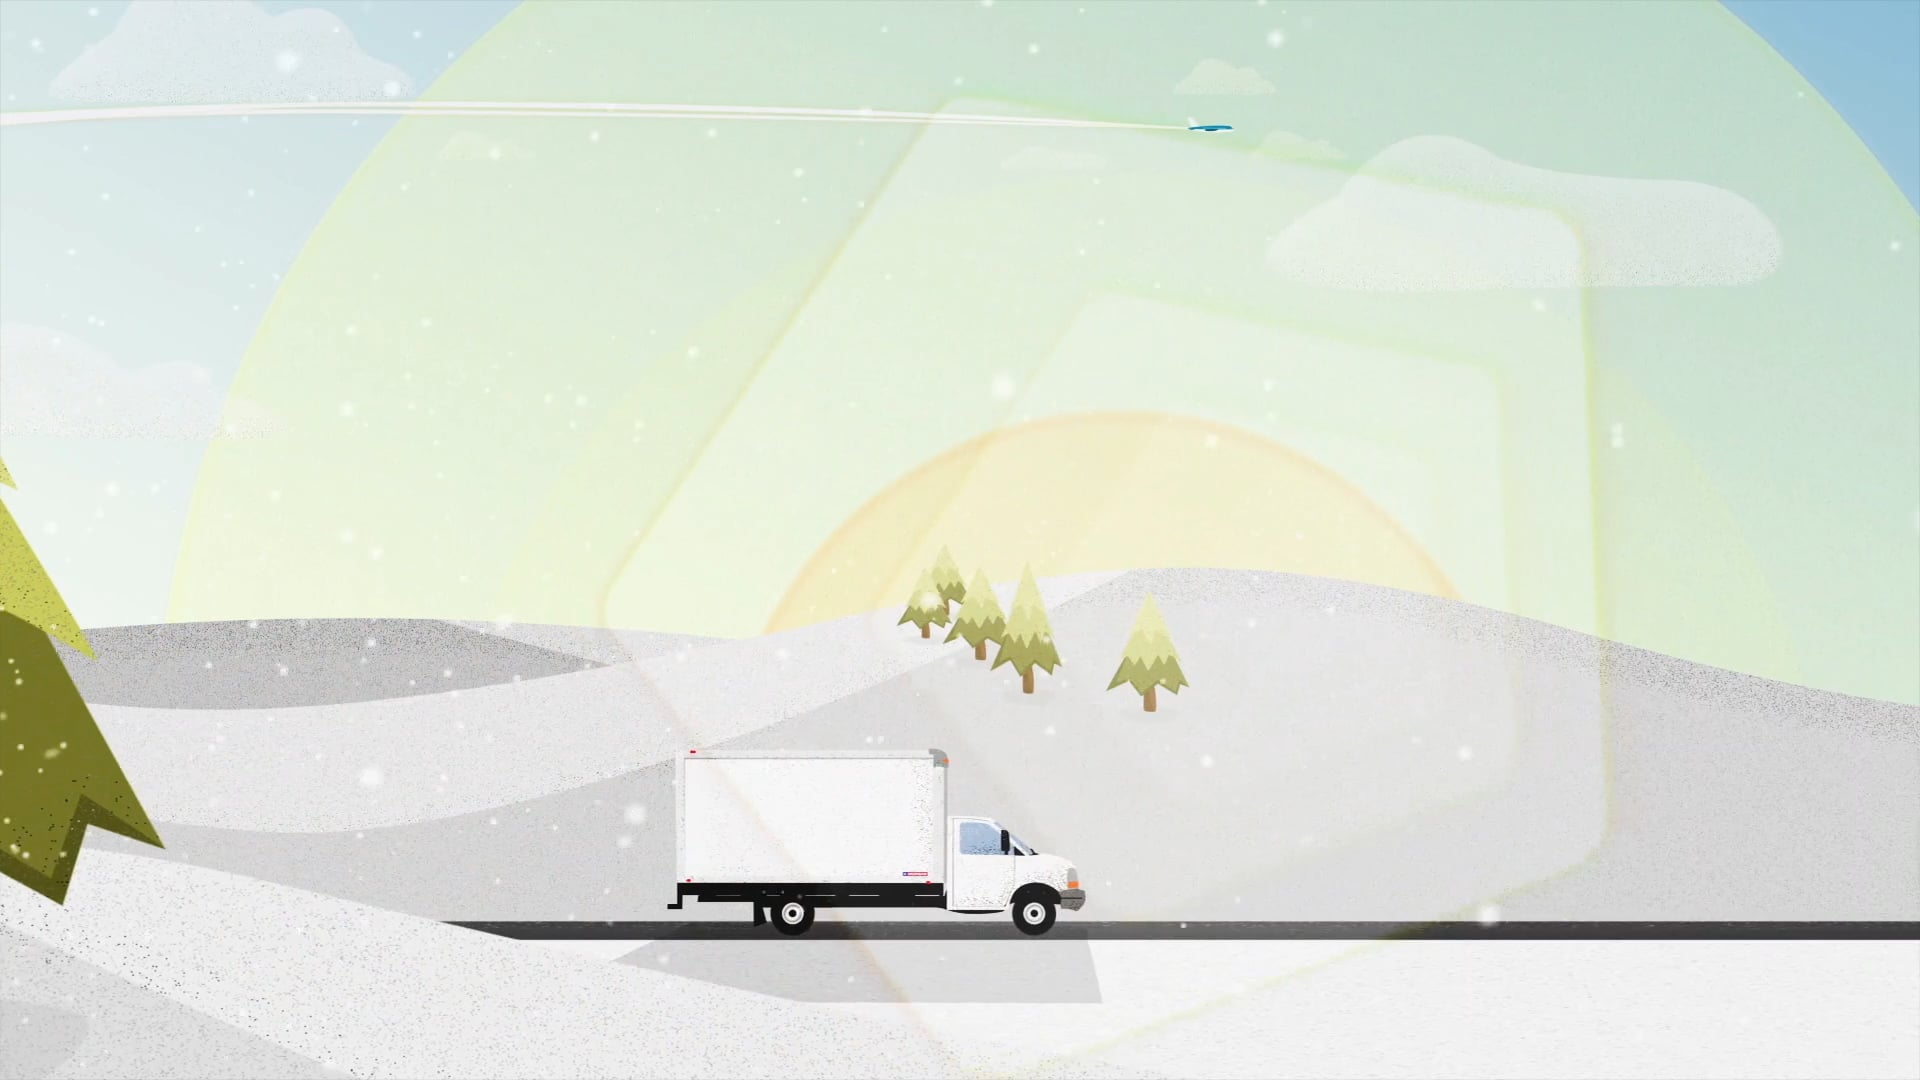 Motion Graphics—Holiday Animation